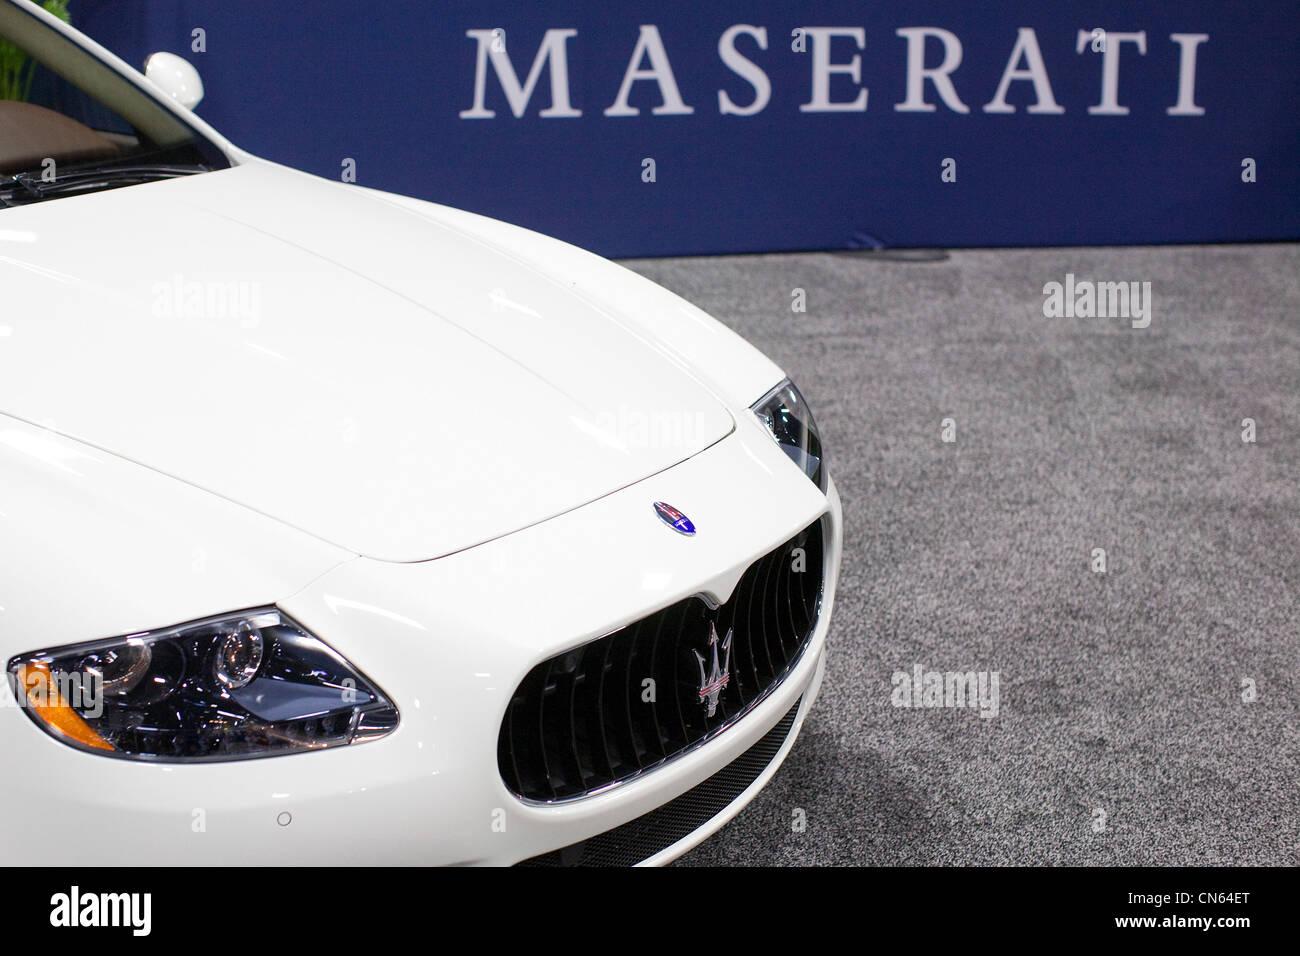 A Maserati on display at the 2012 Washington Auto Show. - Stock Image